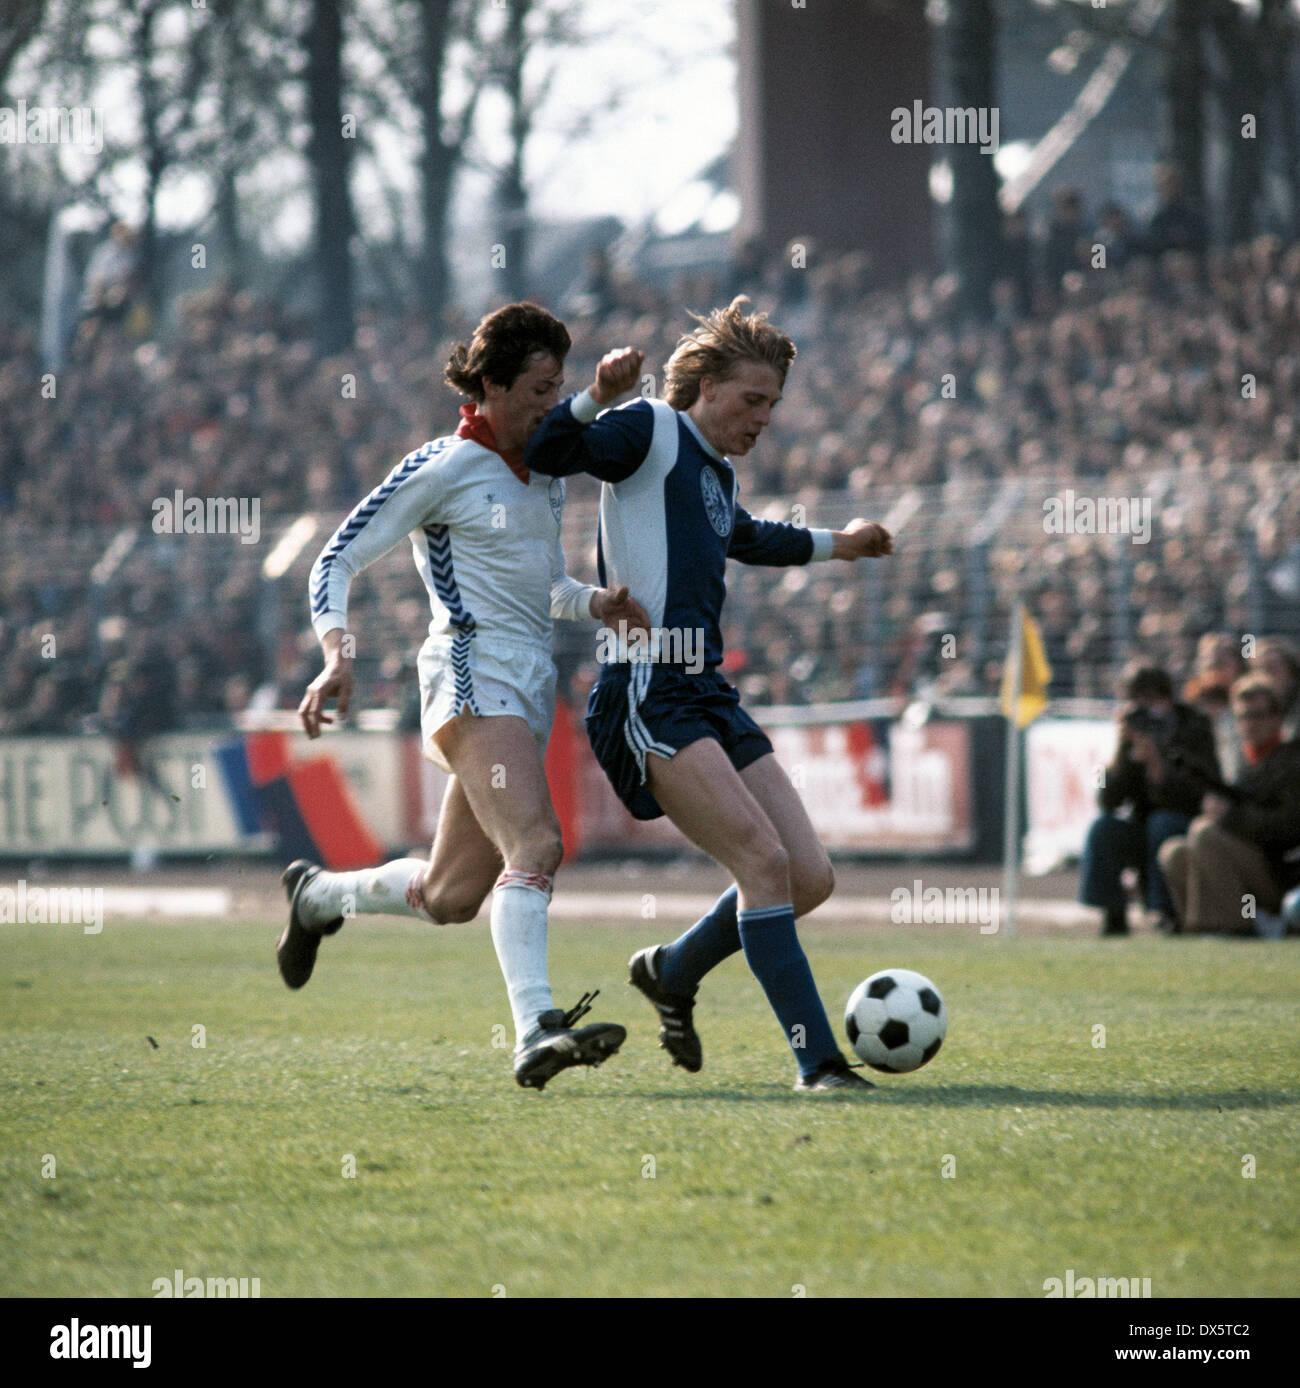 football, DFB Cup, 1976/1977, semifinal, Grotenburg Stadium, FC Bayer 05 Uerdingen versus Hertha BSC Berlin 0:1, scene of the match, Franz Raschid (05) left and Wolfgang Sidka (Hertha) - Stock Image